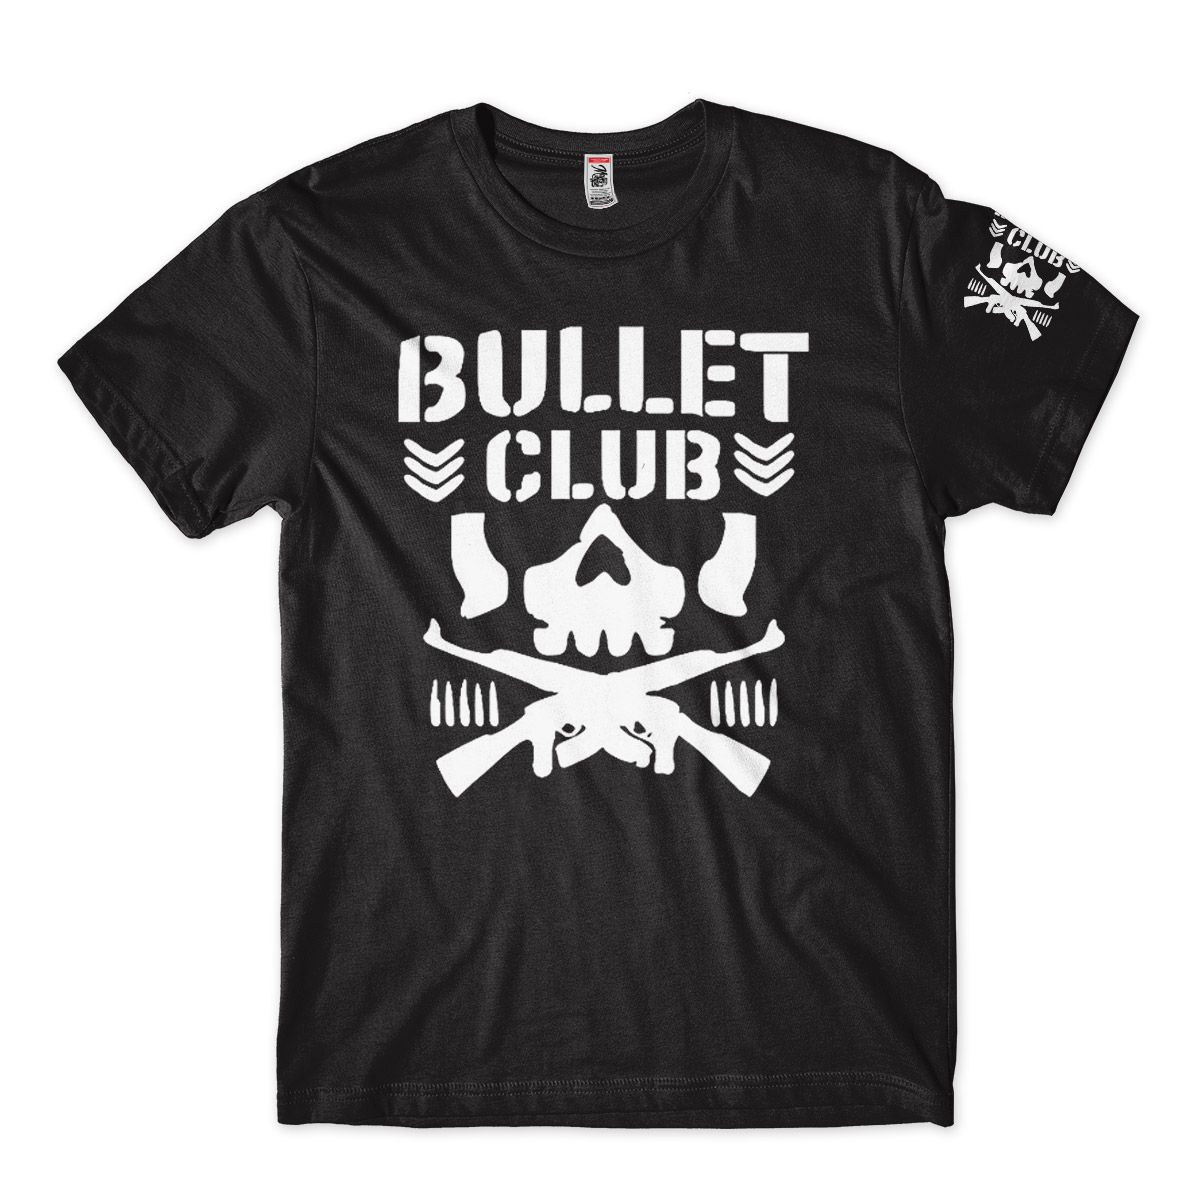 Camiseta Wwe Bullet Club Camisa Feminina Pro Wrestling Preta